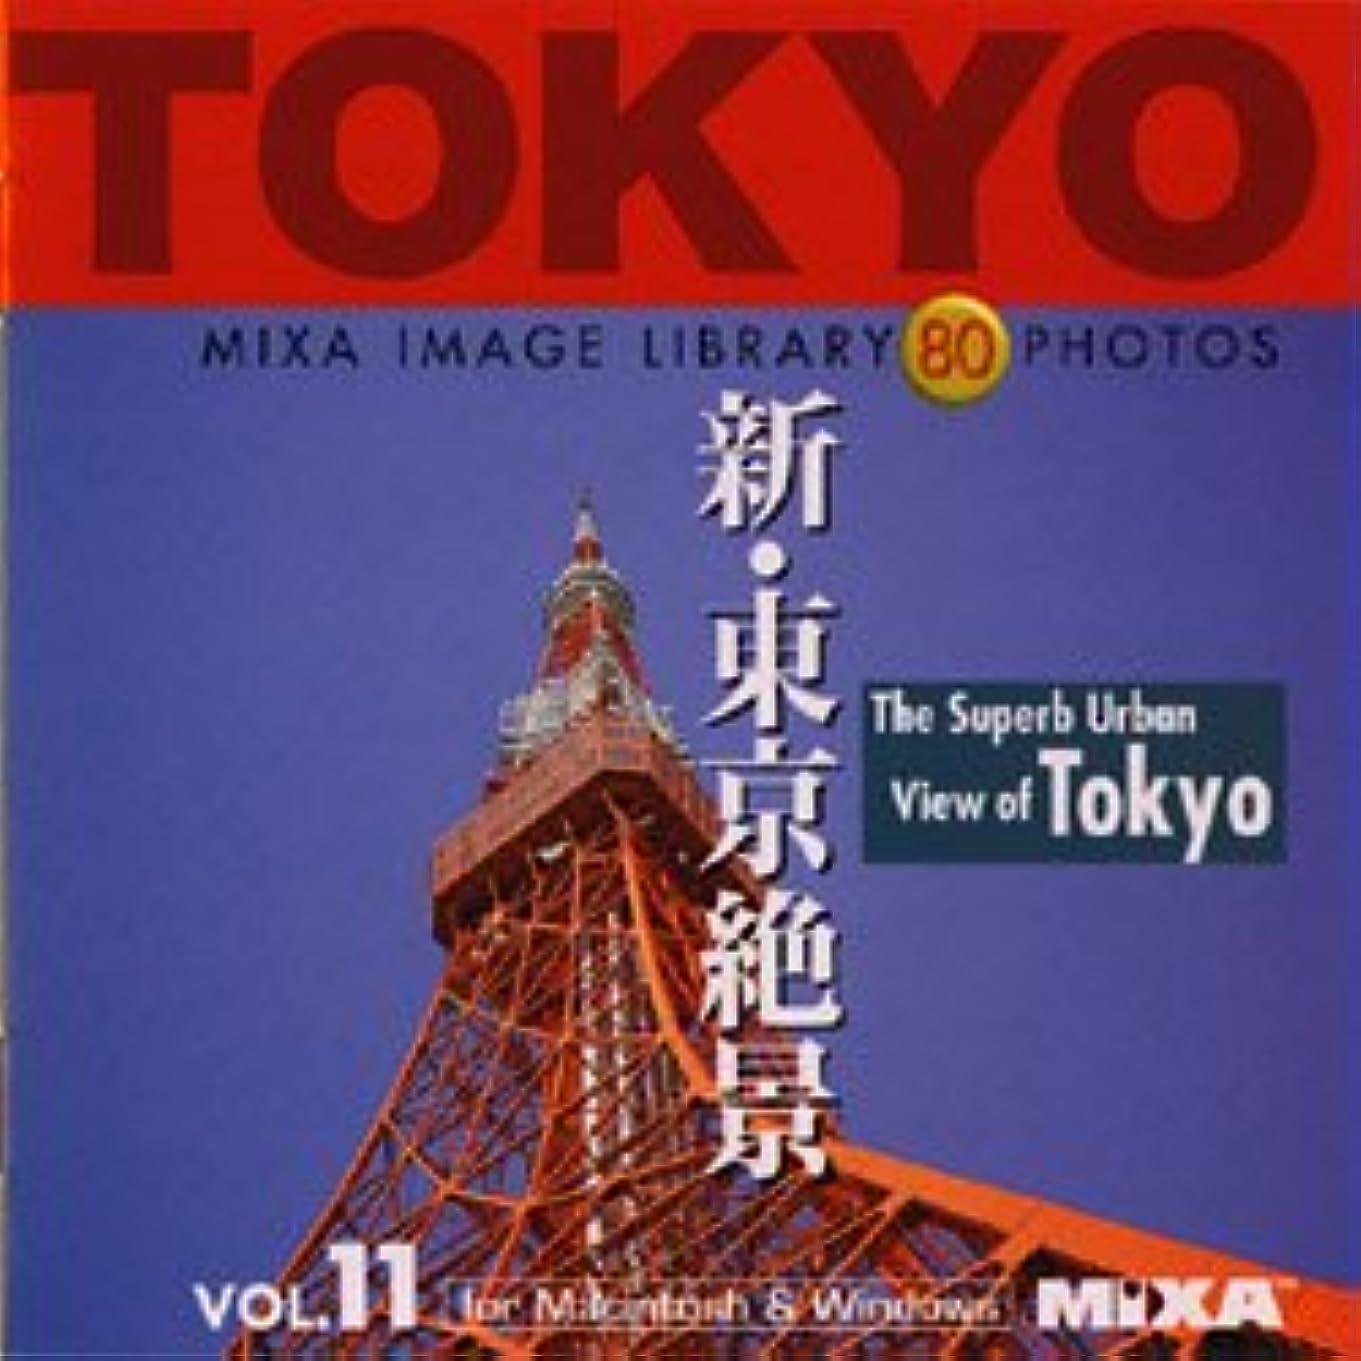 闇垂直甘美なMIXA IMAGE LIBRARY Vol.11 新?東京絶景